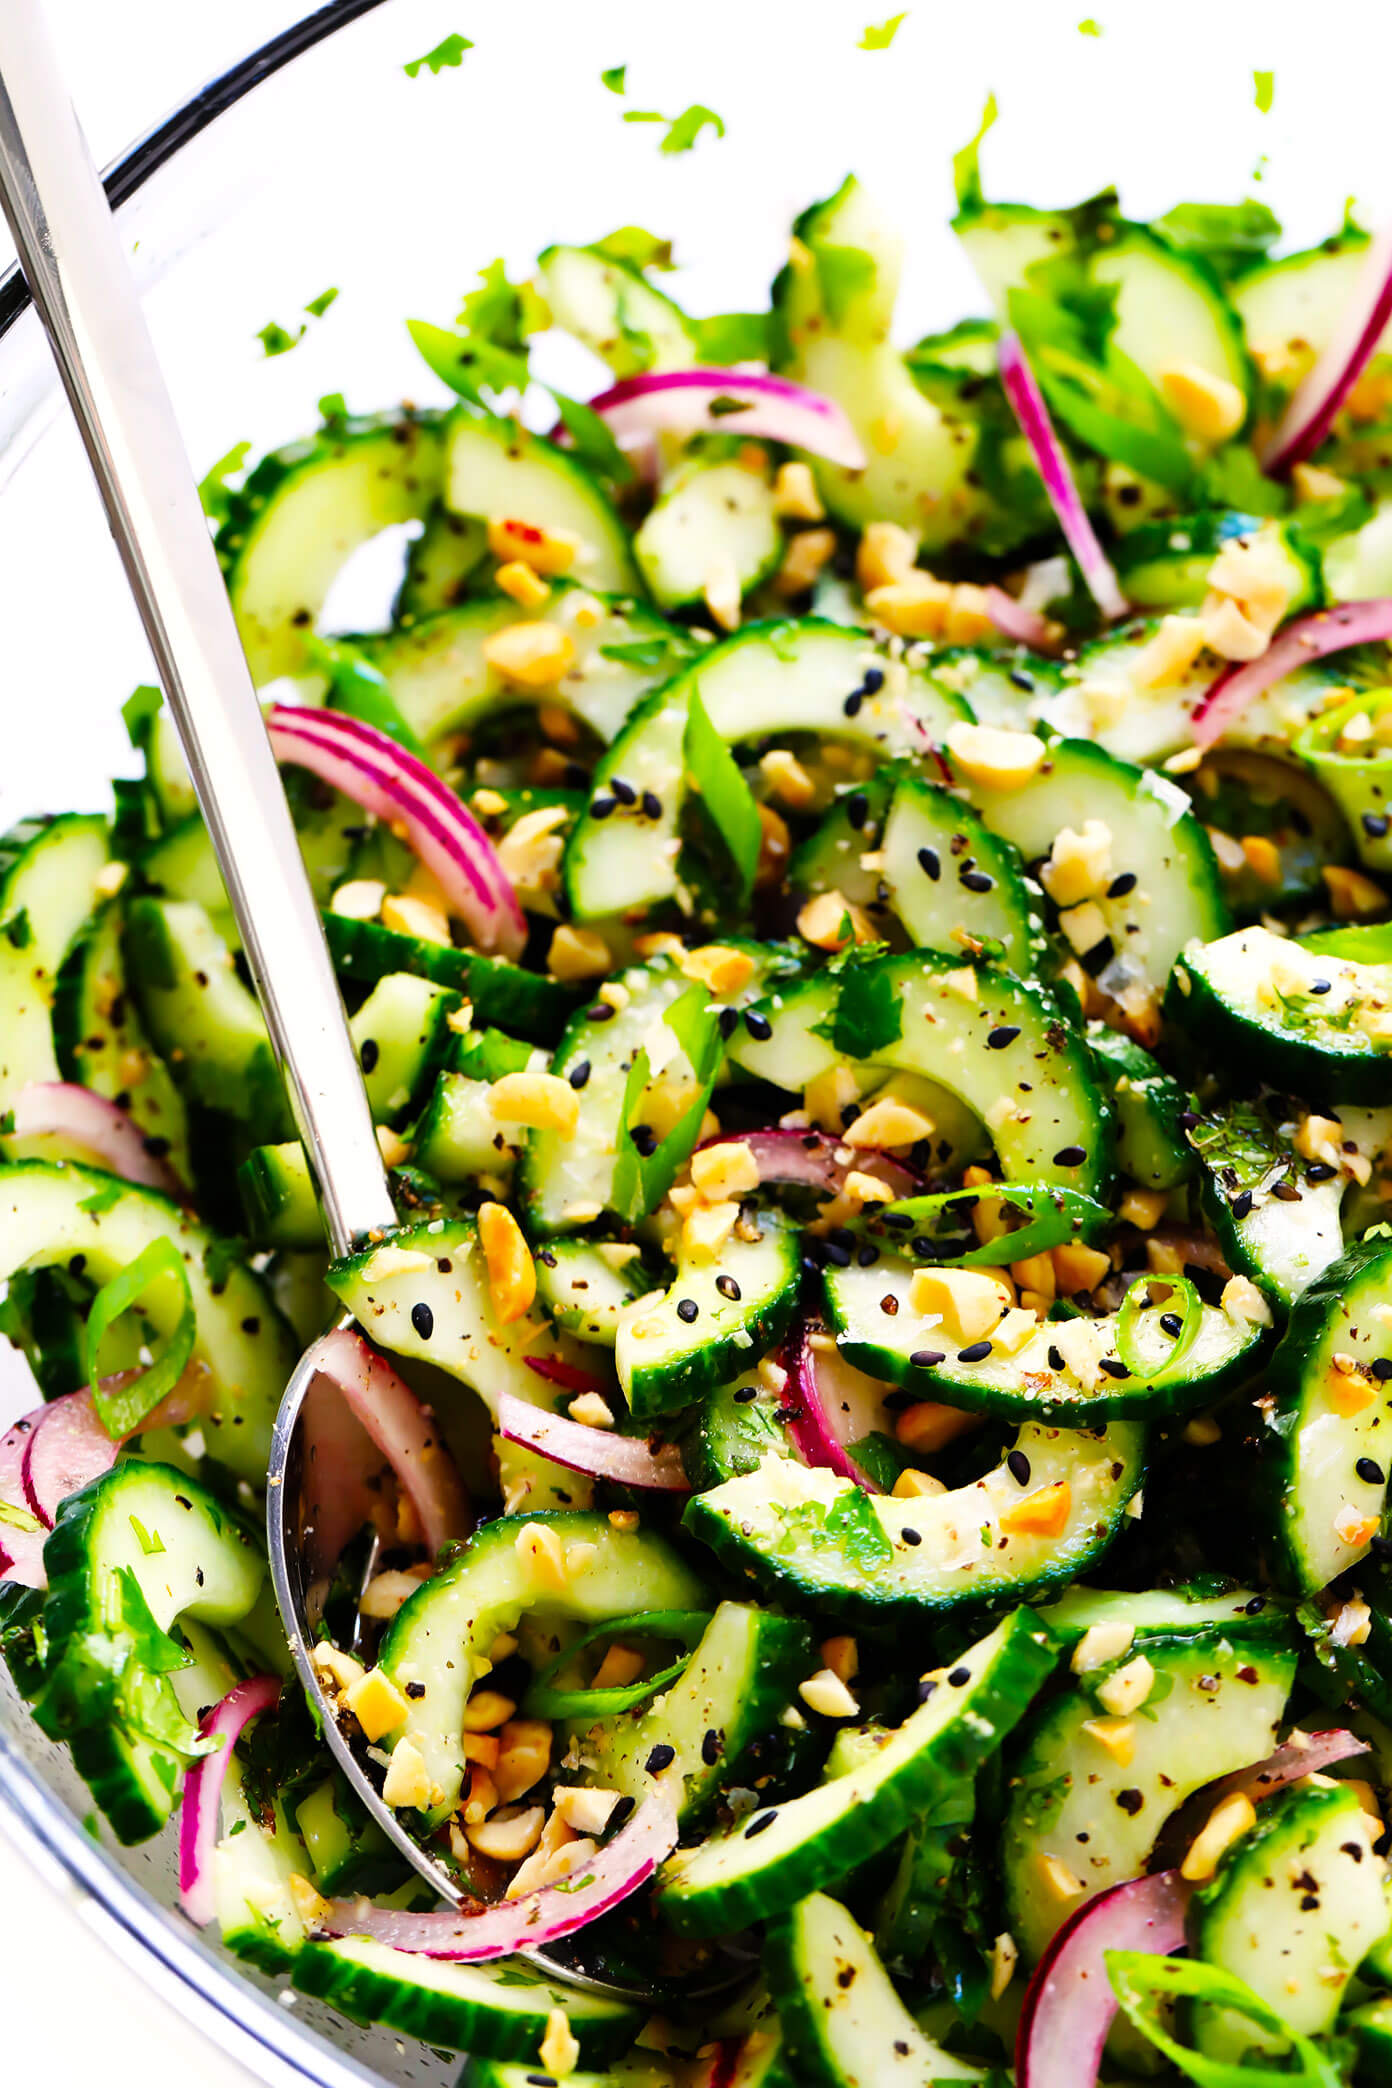 How To Make Thai Cucumber Salad